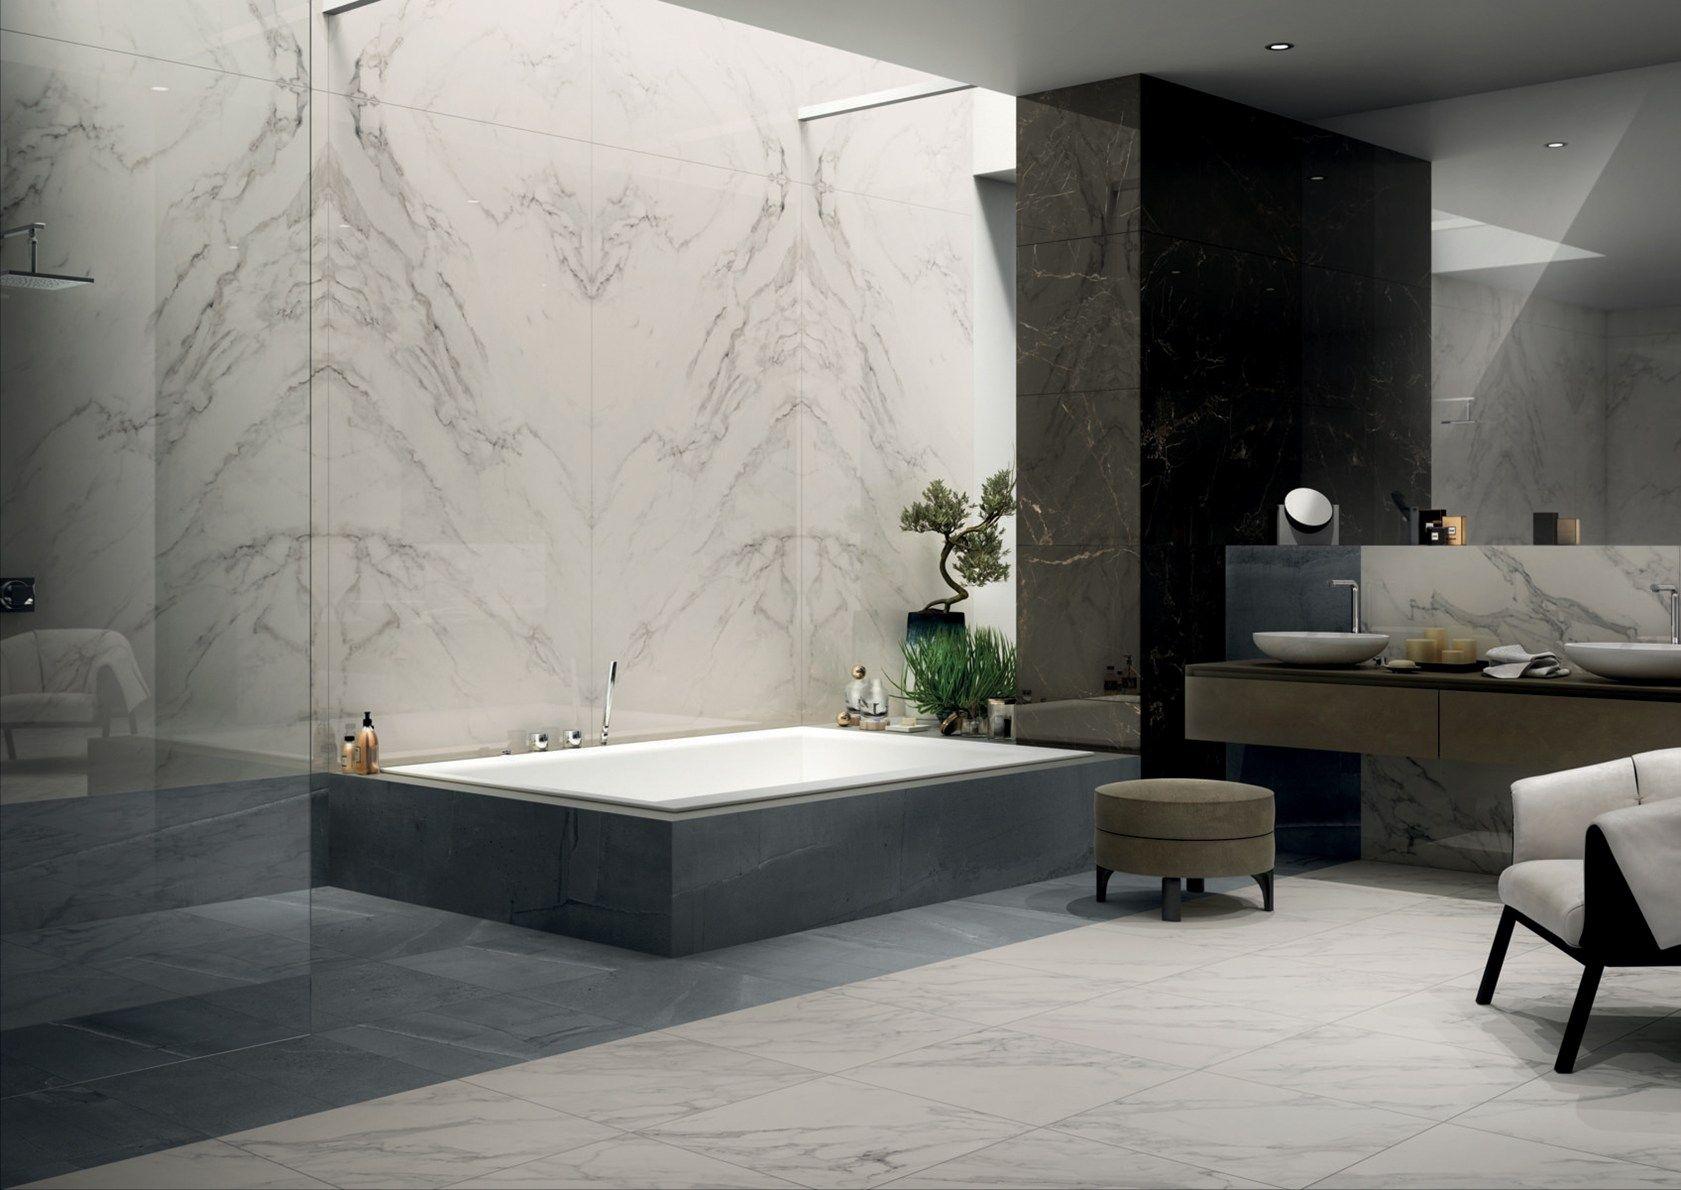 overmaterial ceramiche caesar at cersaie. Black Bedroom Furniture Sets. Home Design Ideas